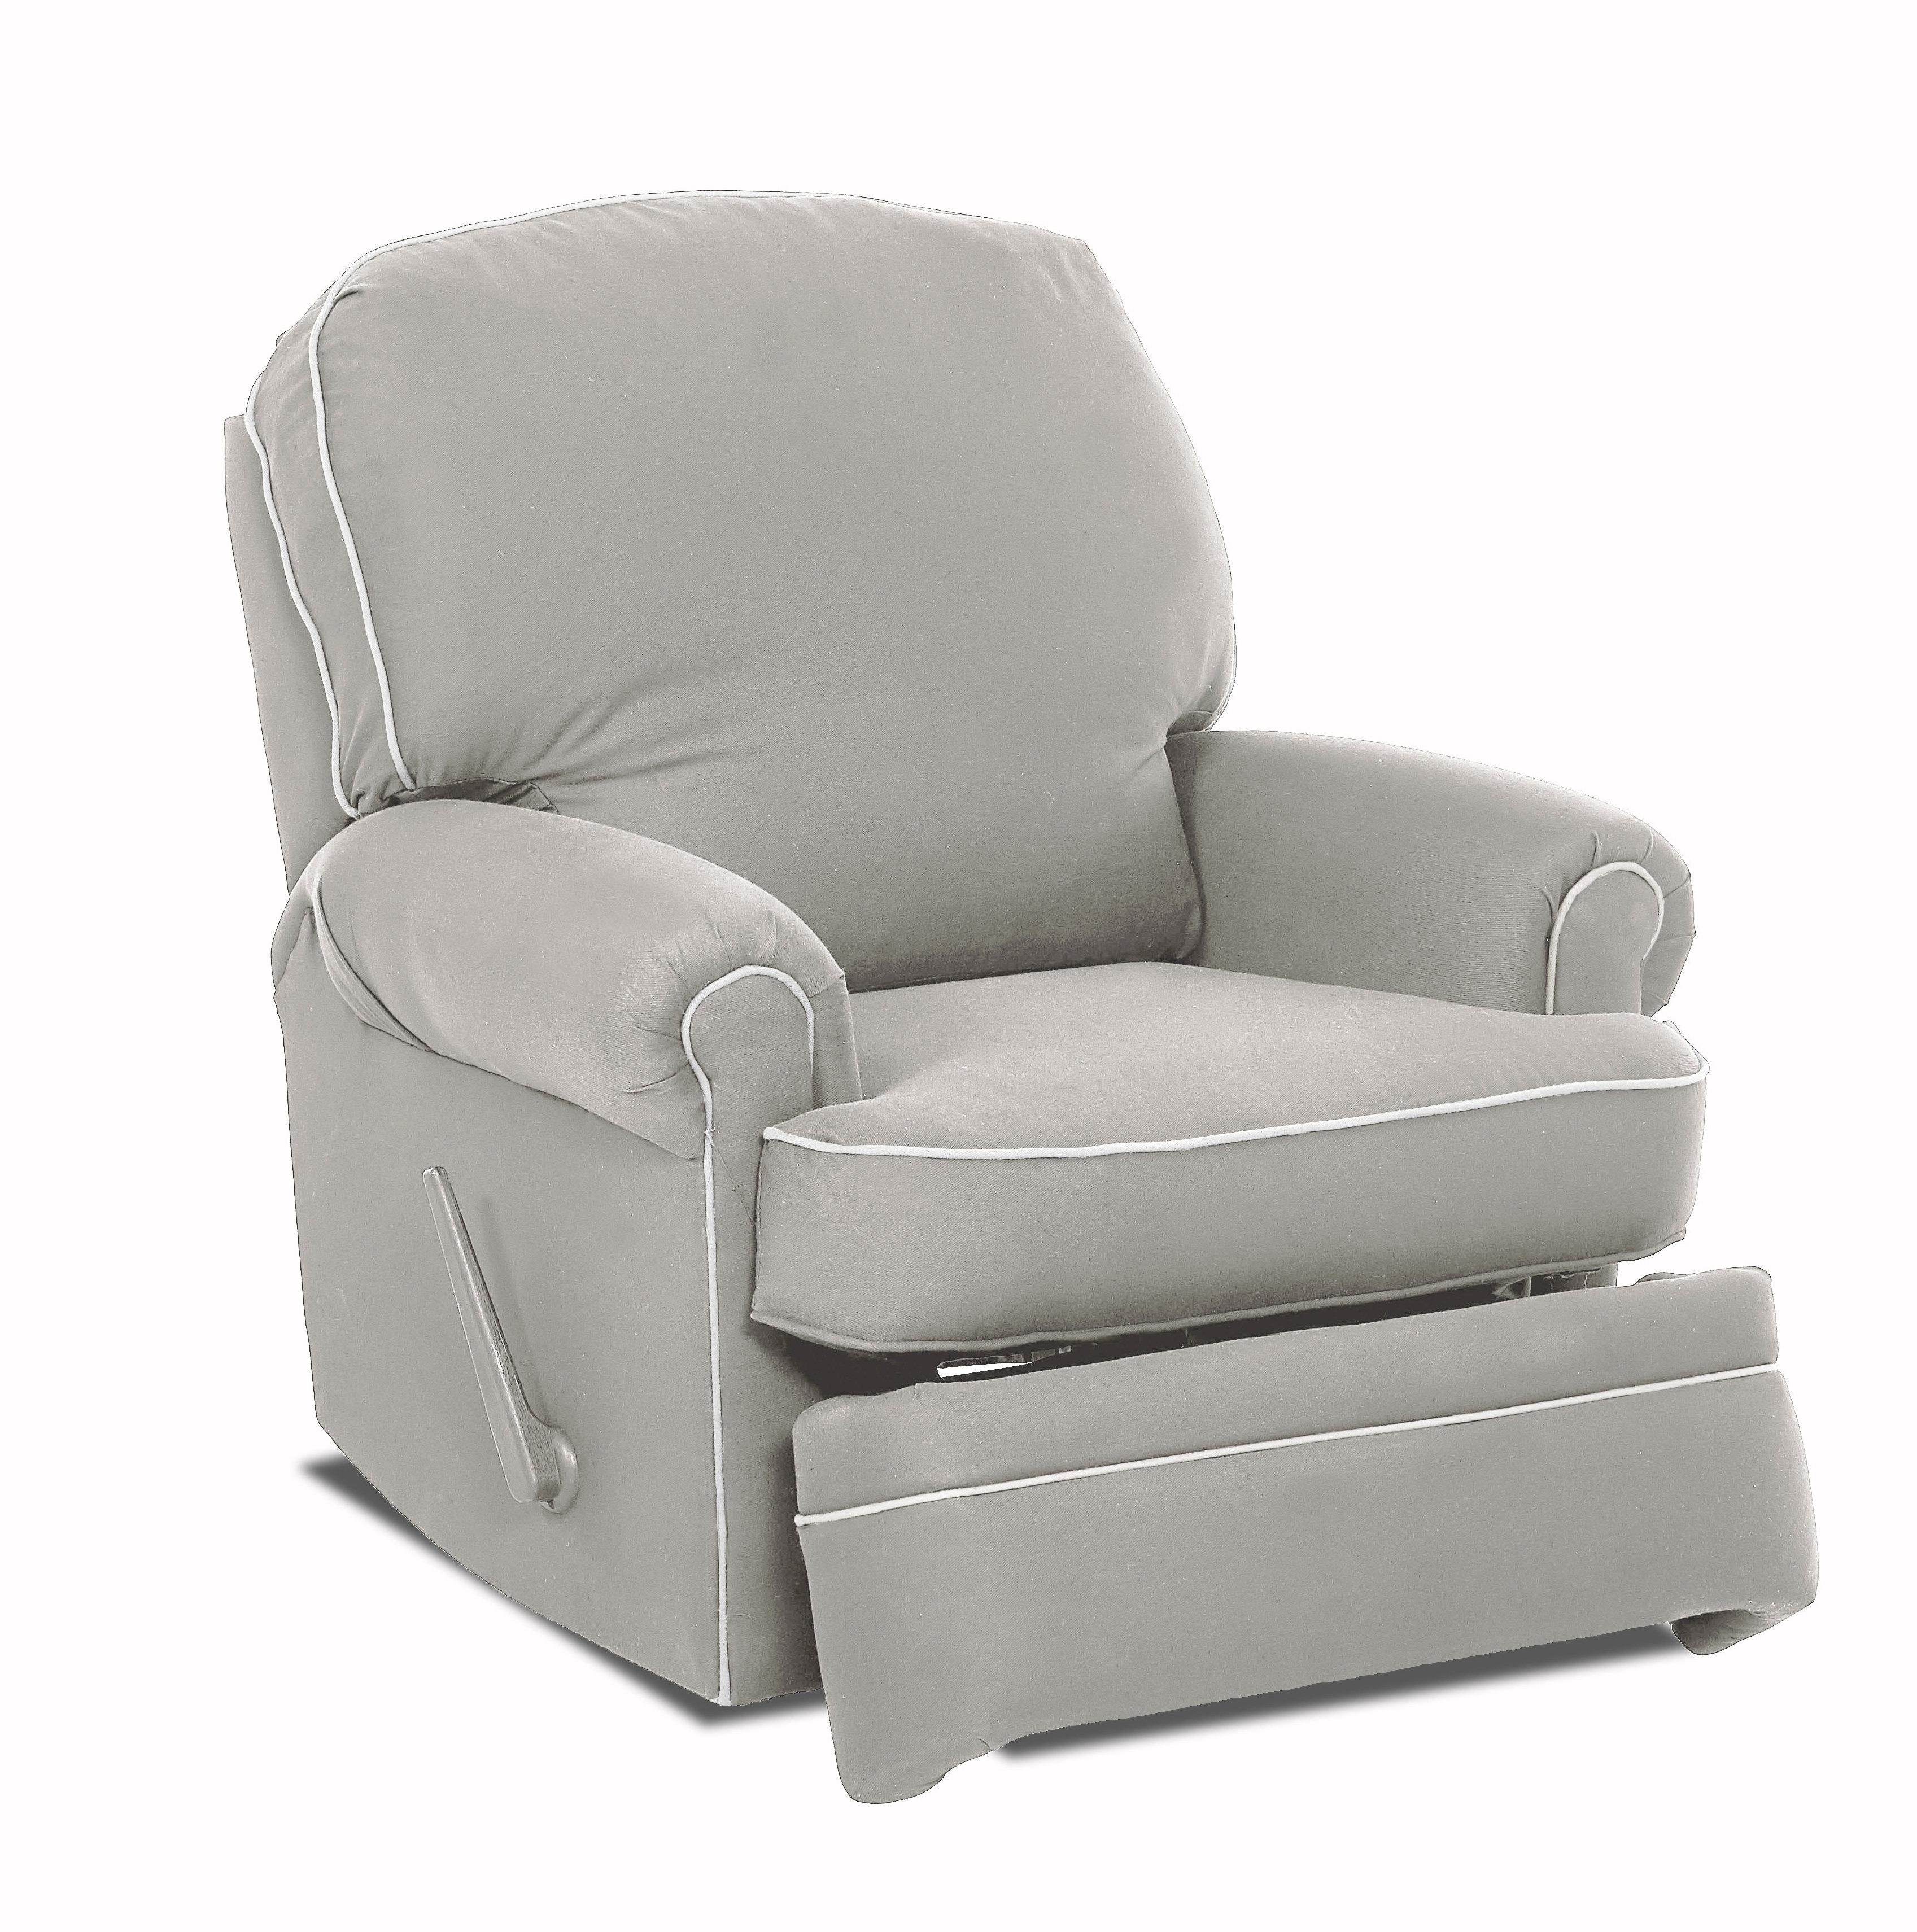 Wayfair Custom Upholstery™ Stanford Glider Swivel Recliner | Wayfair Regarding Katrina Blue Swivel Glider Chairs (View 2 of 20)